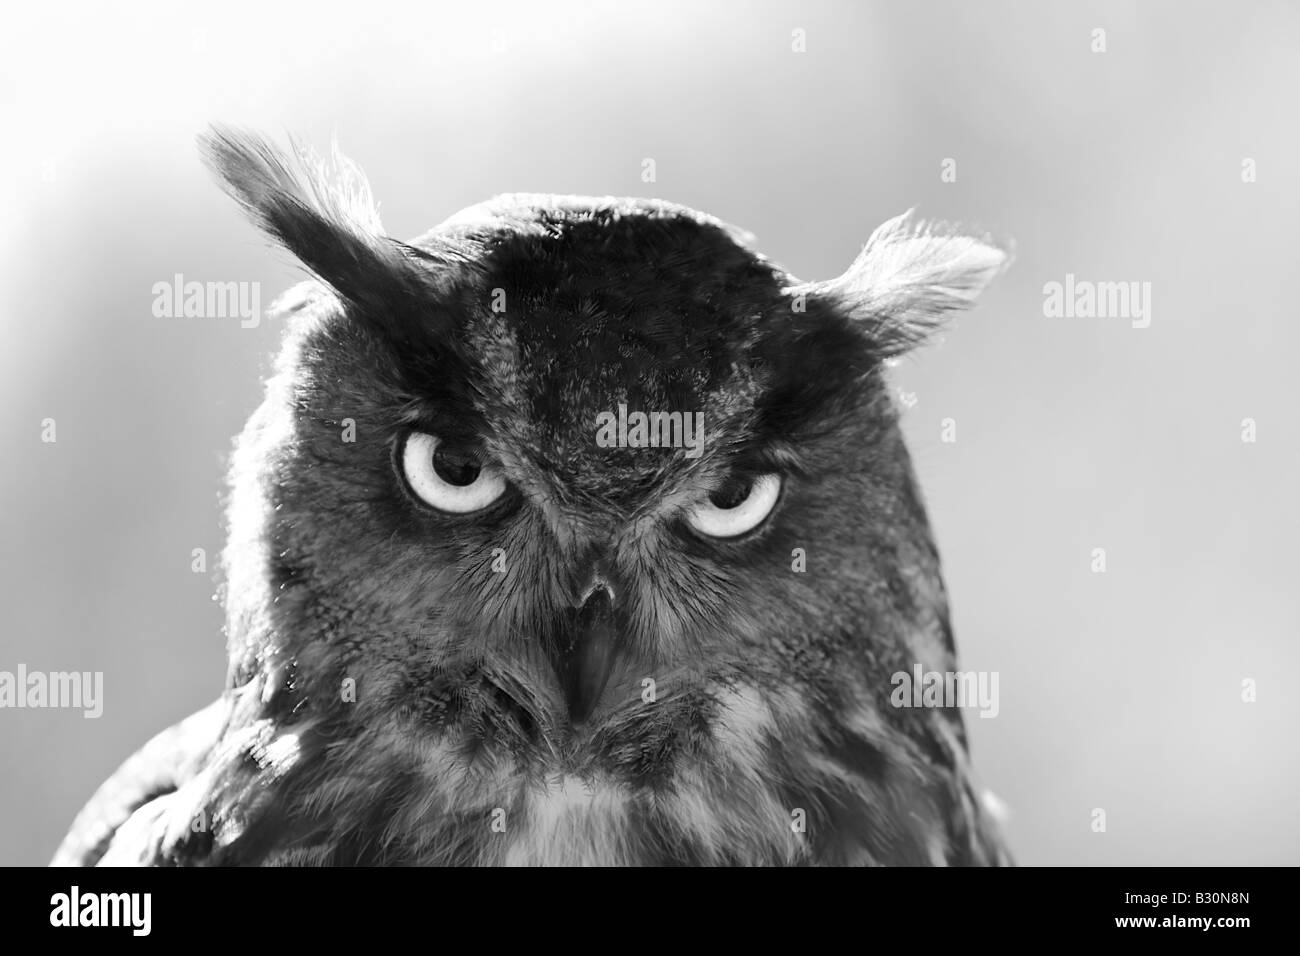 Eurasian Eagle Owl Bubo bubo - Stock Image